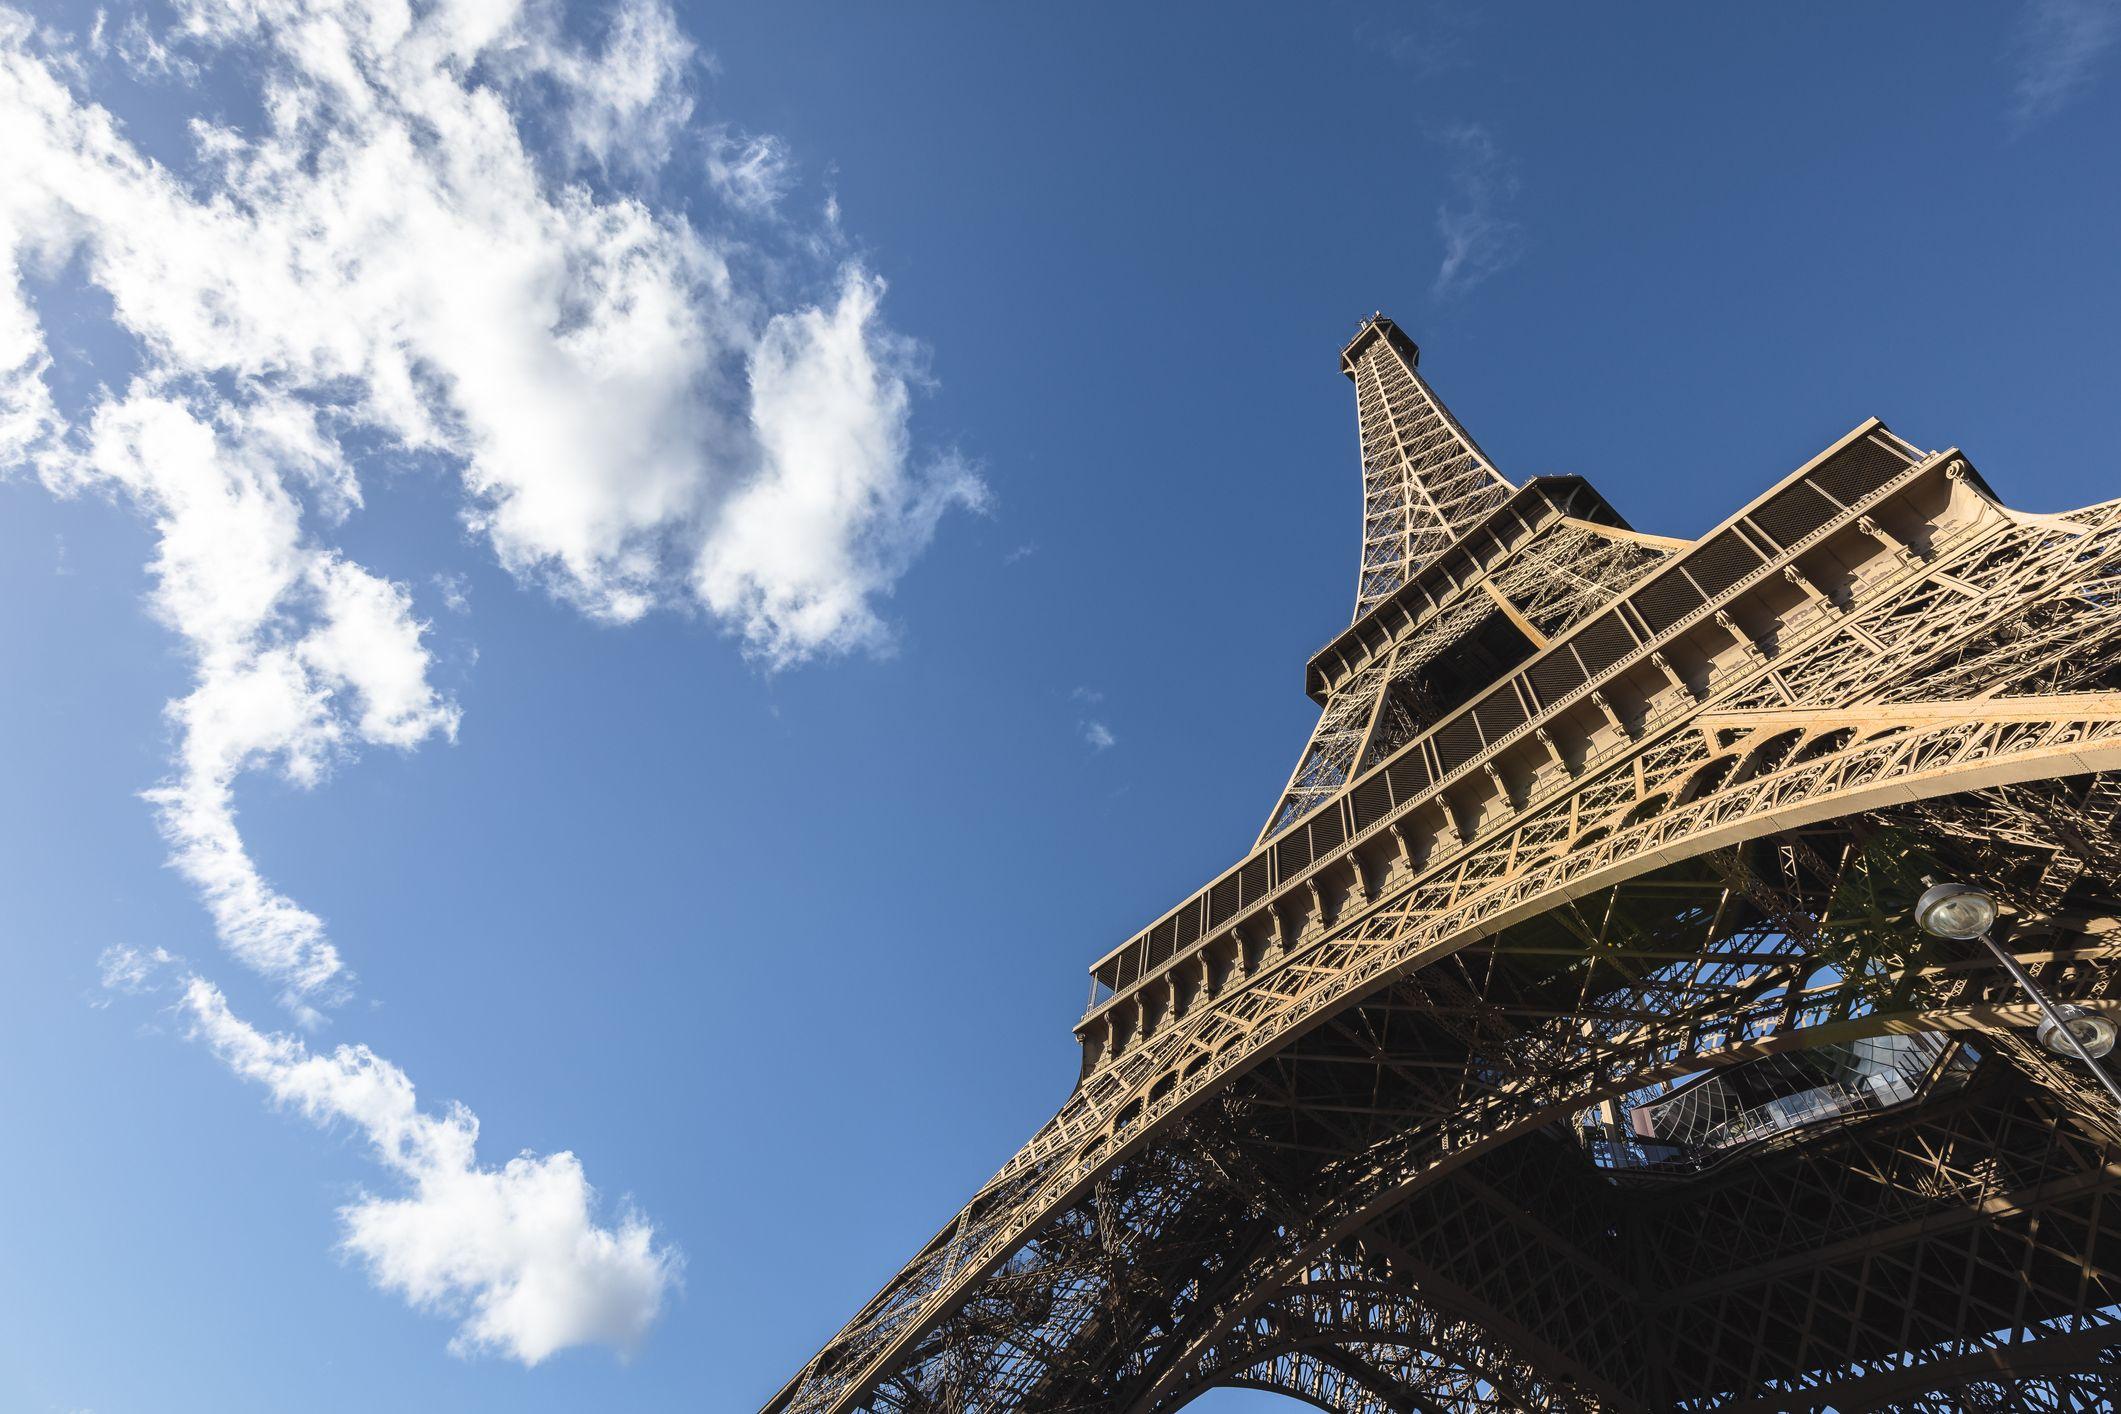 Ma perché la Torre Eiffel sarà dipinta d'oro?